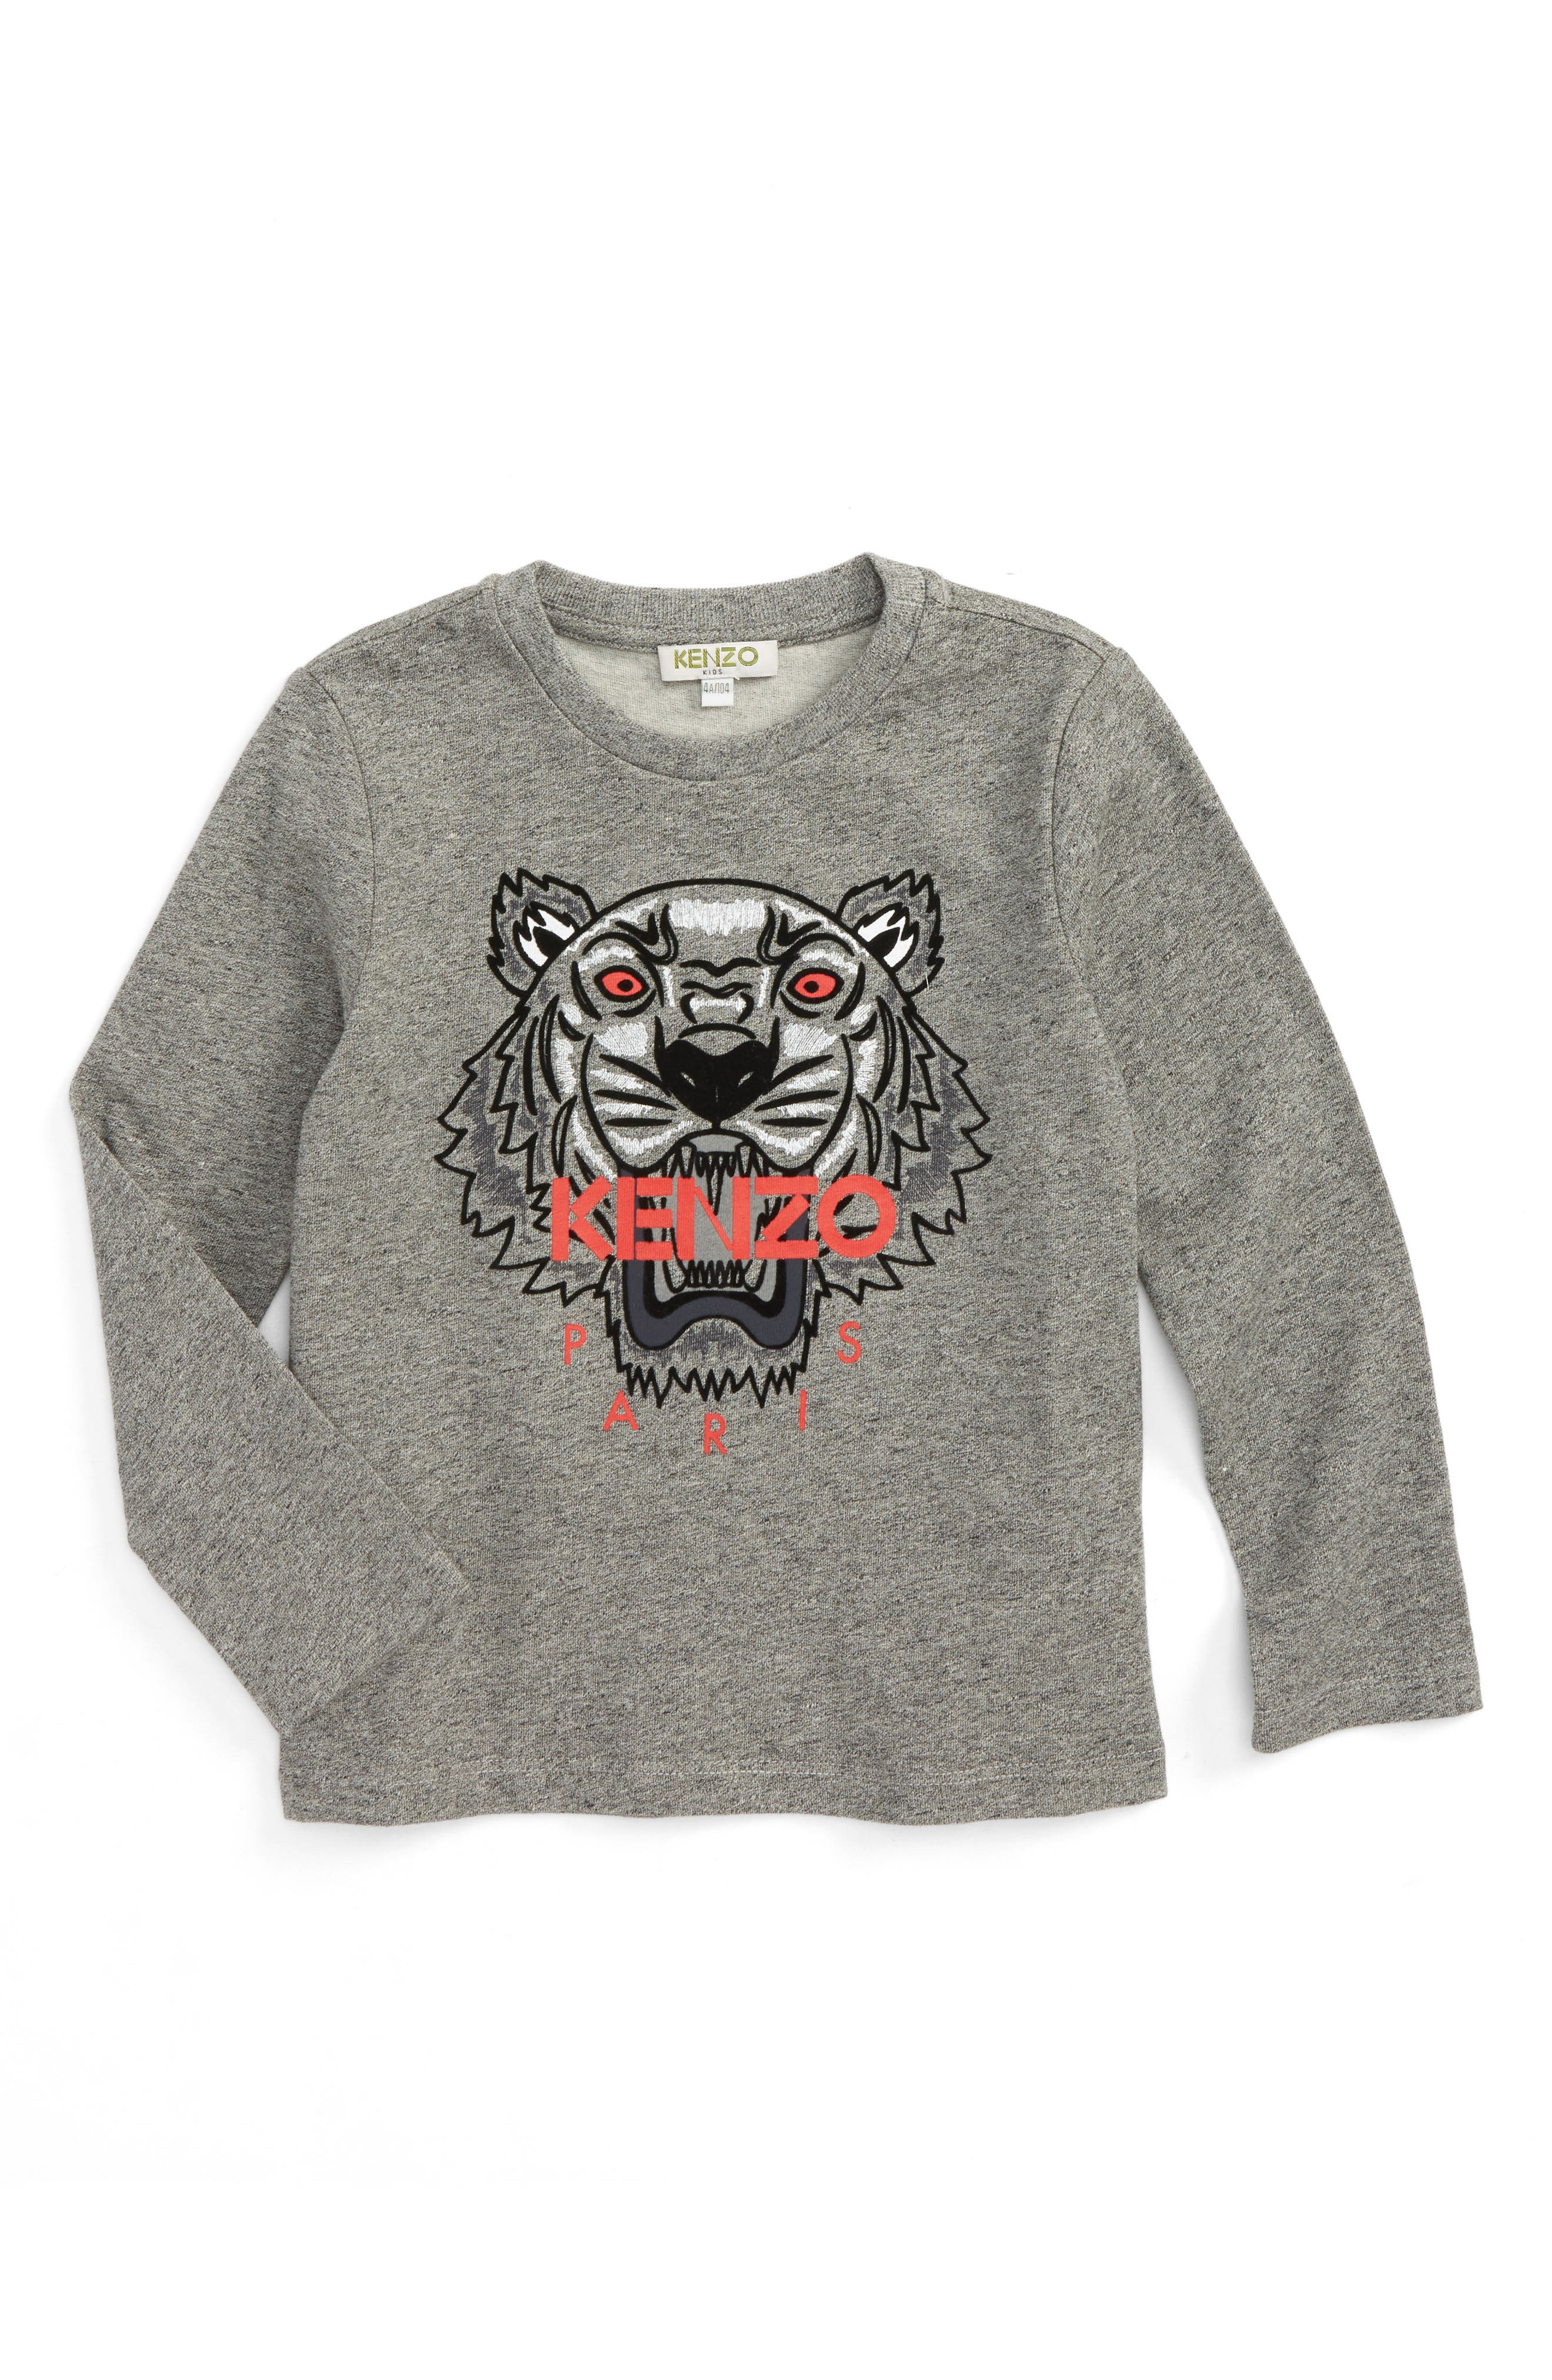 KENZO Tiger Graphic Tee (Toddler Boys, Little Boys & Big Boys)